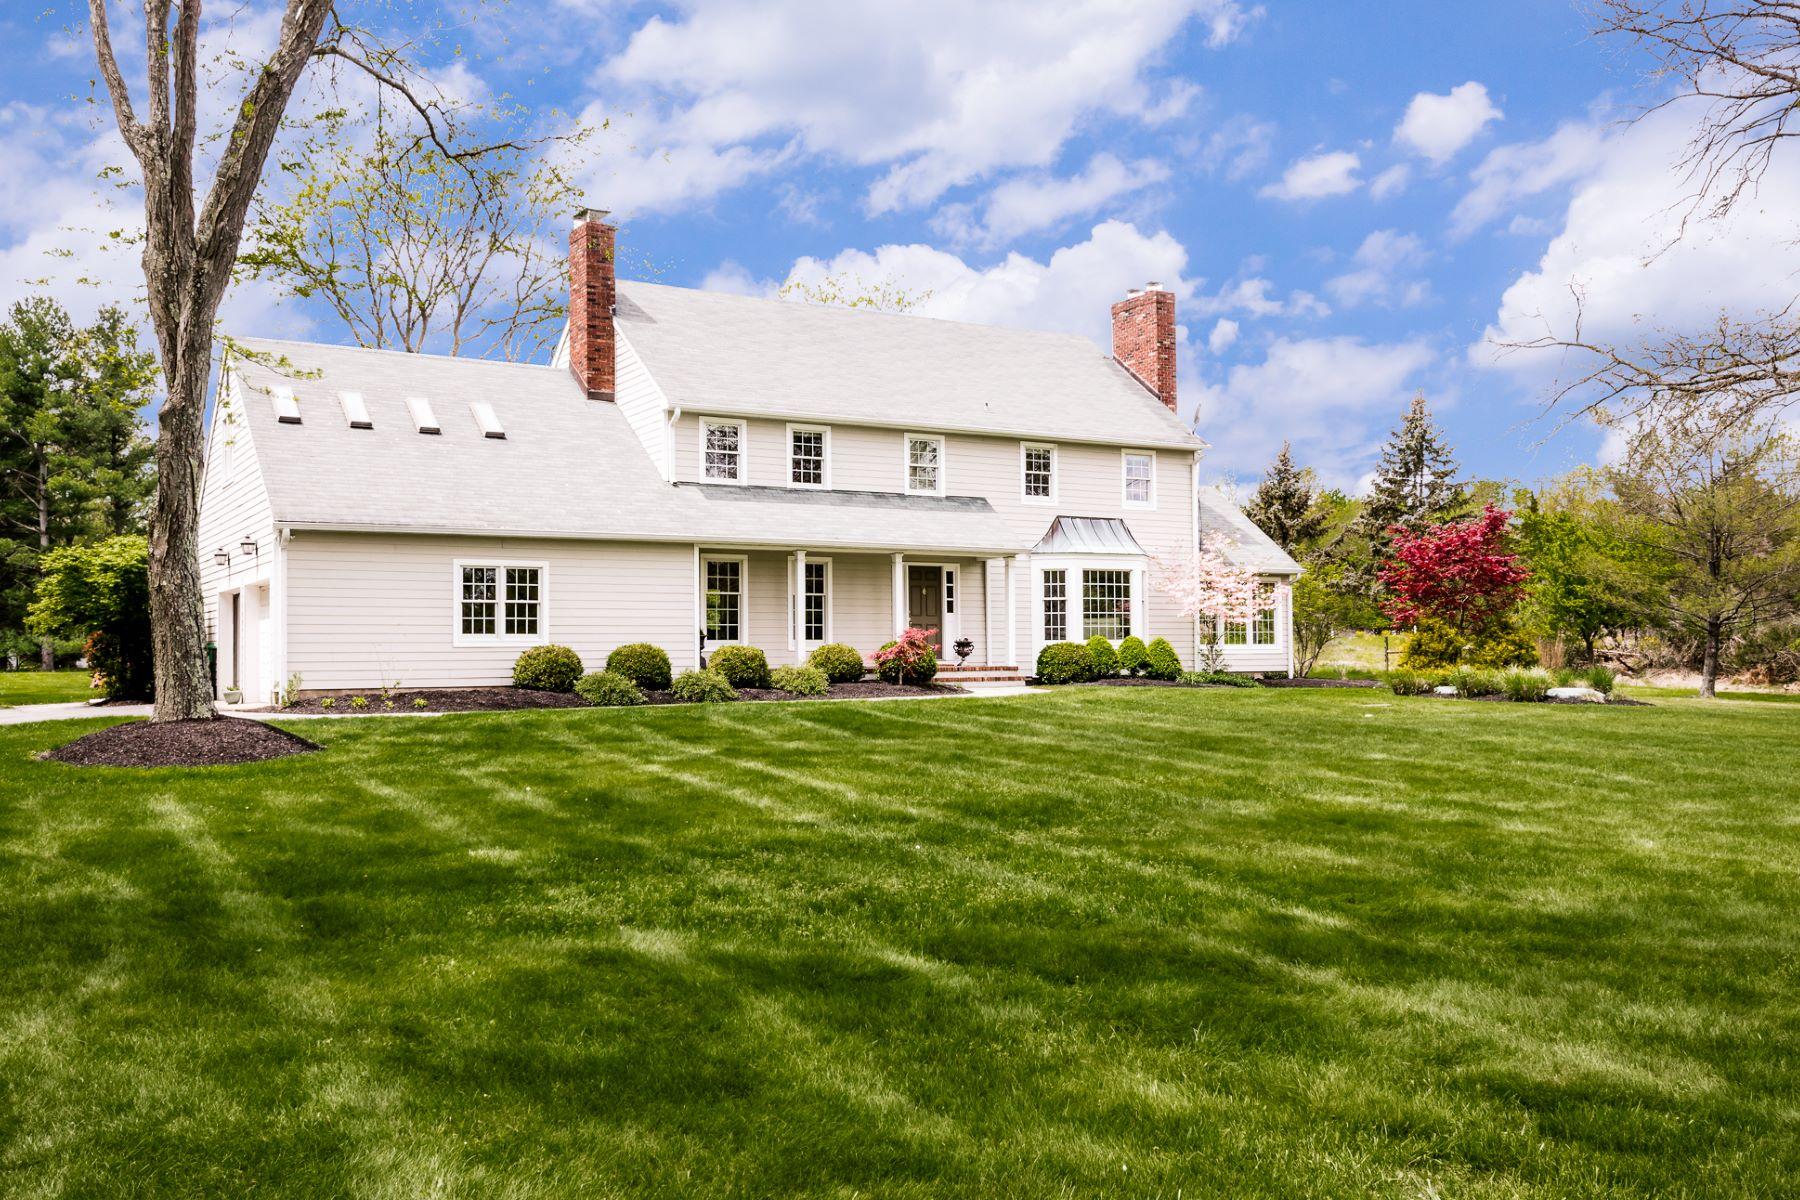 Vivienda unifamiliar por un Venta en Modern Comforts And A Homey Feel - Hopewell Township 6 Blue Spruce Drive Pennington, Nueva Jersey, 08534 Estados Unidos